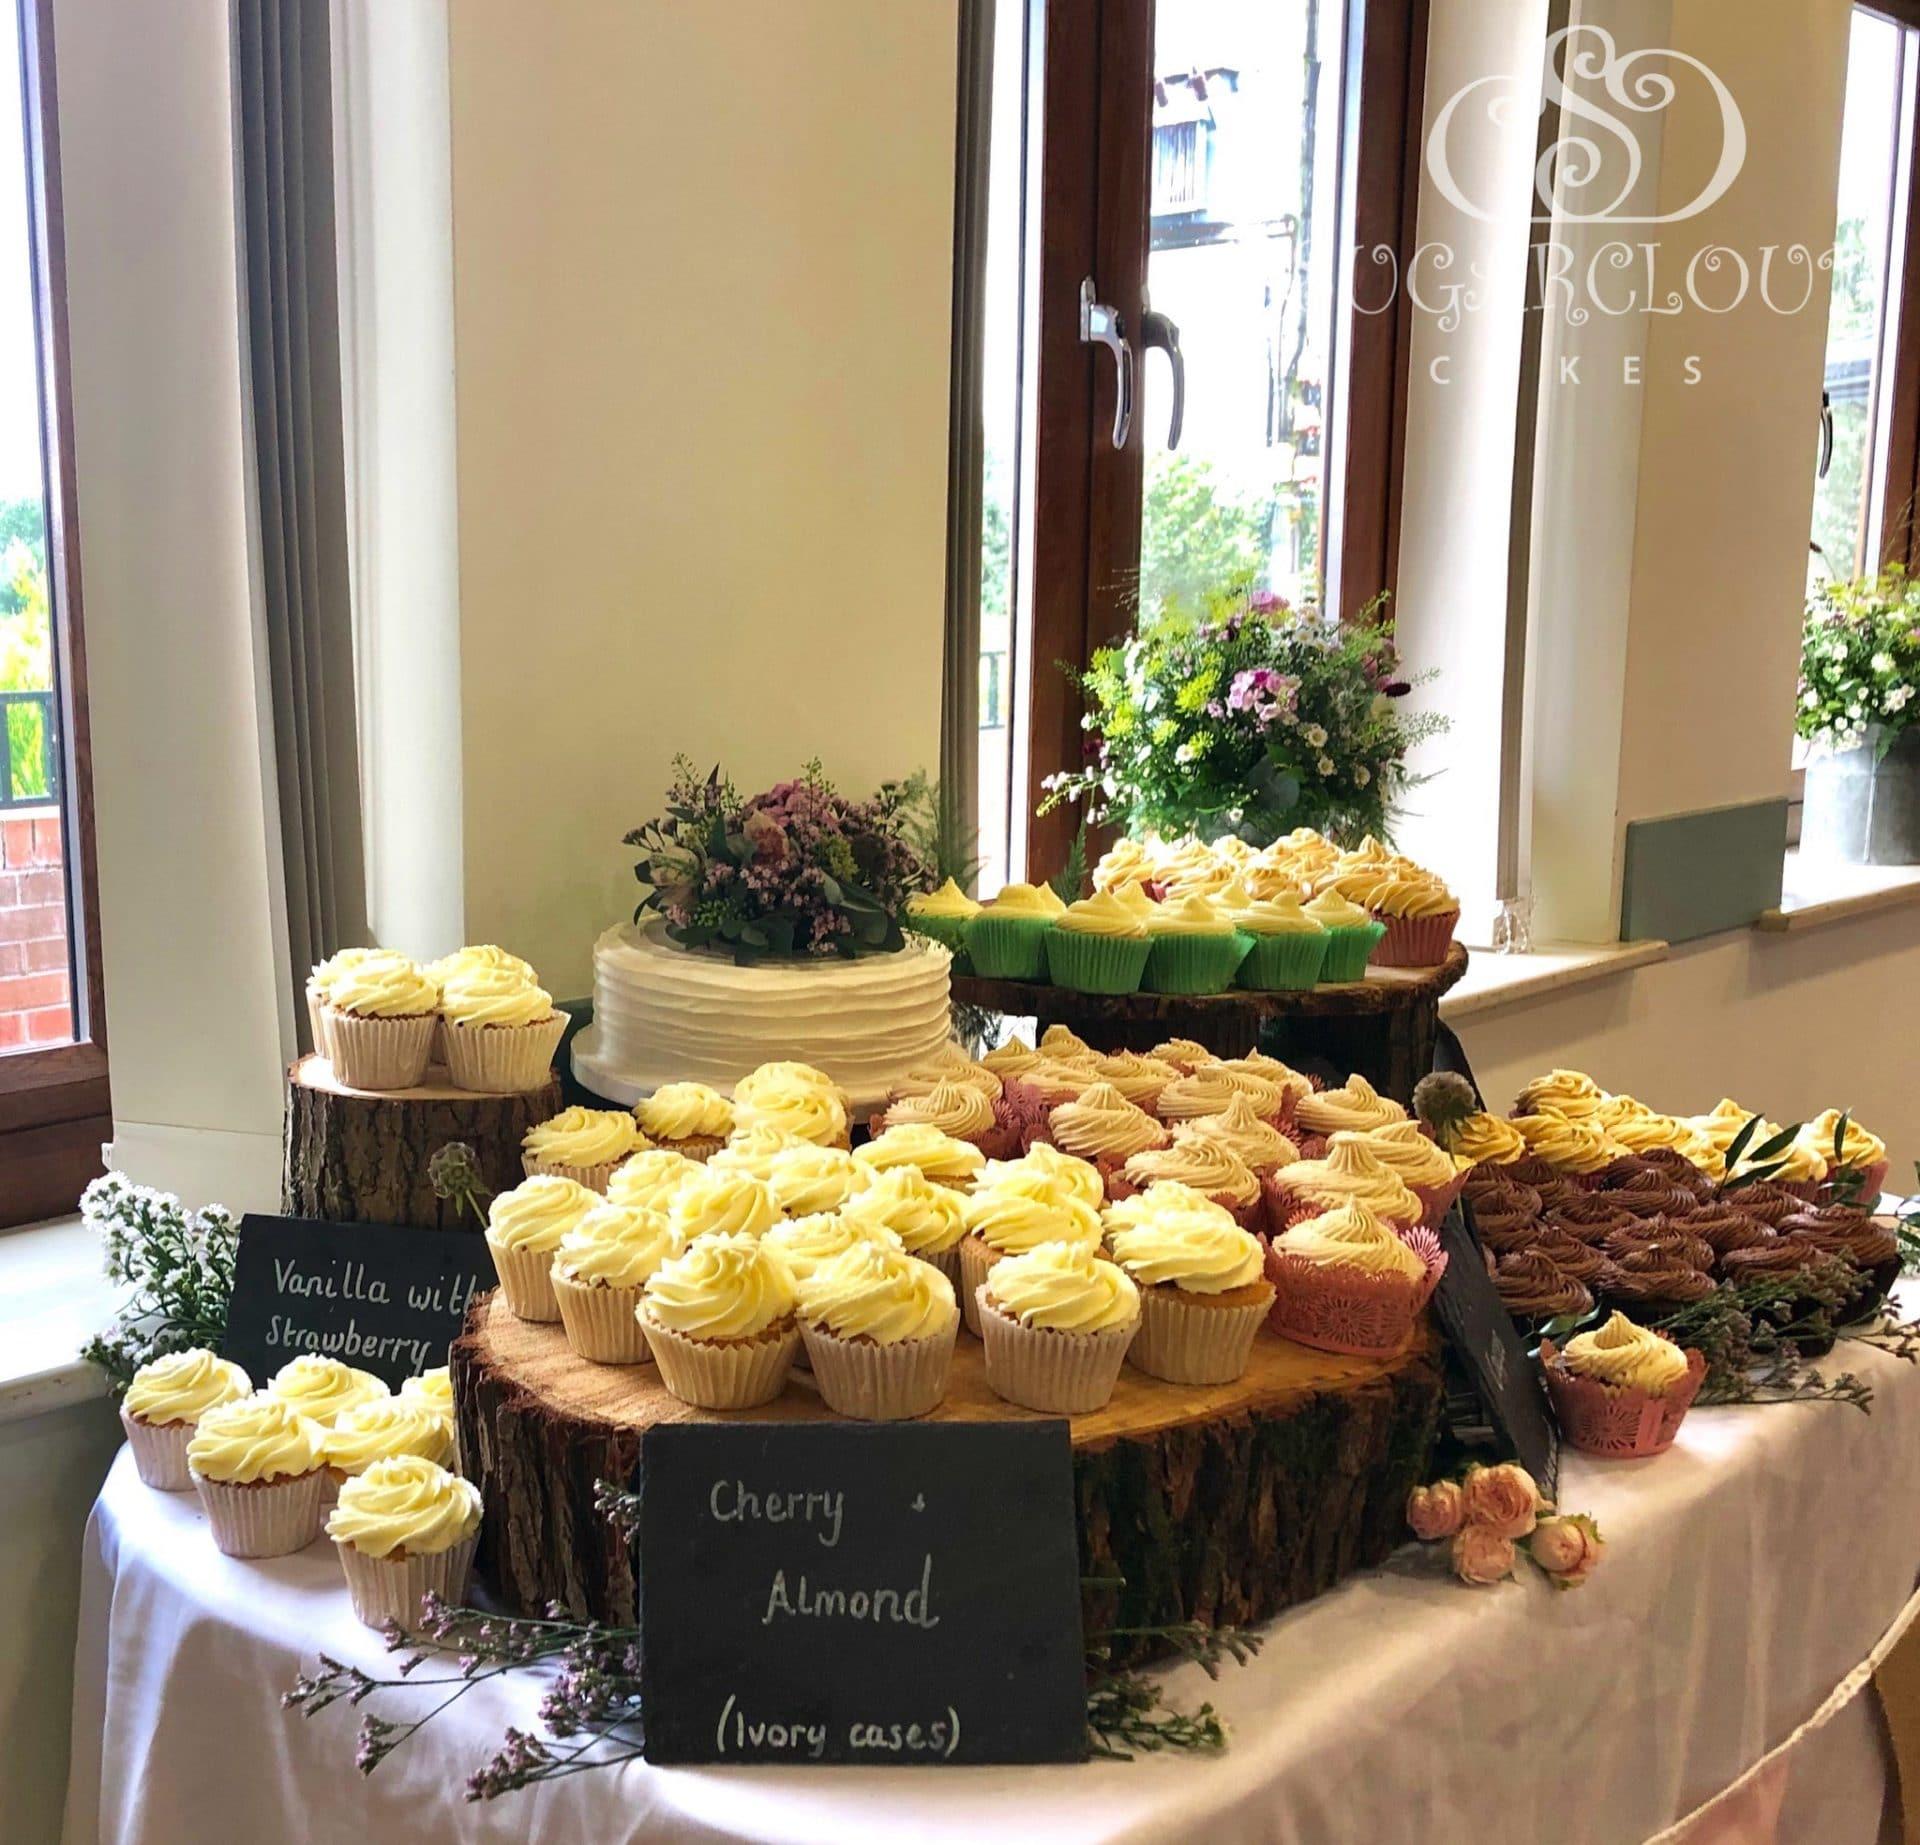 A selection of wedding cupcakes